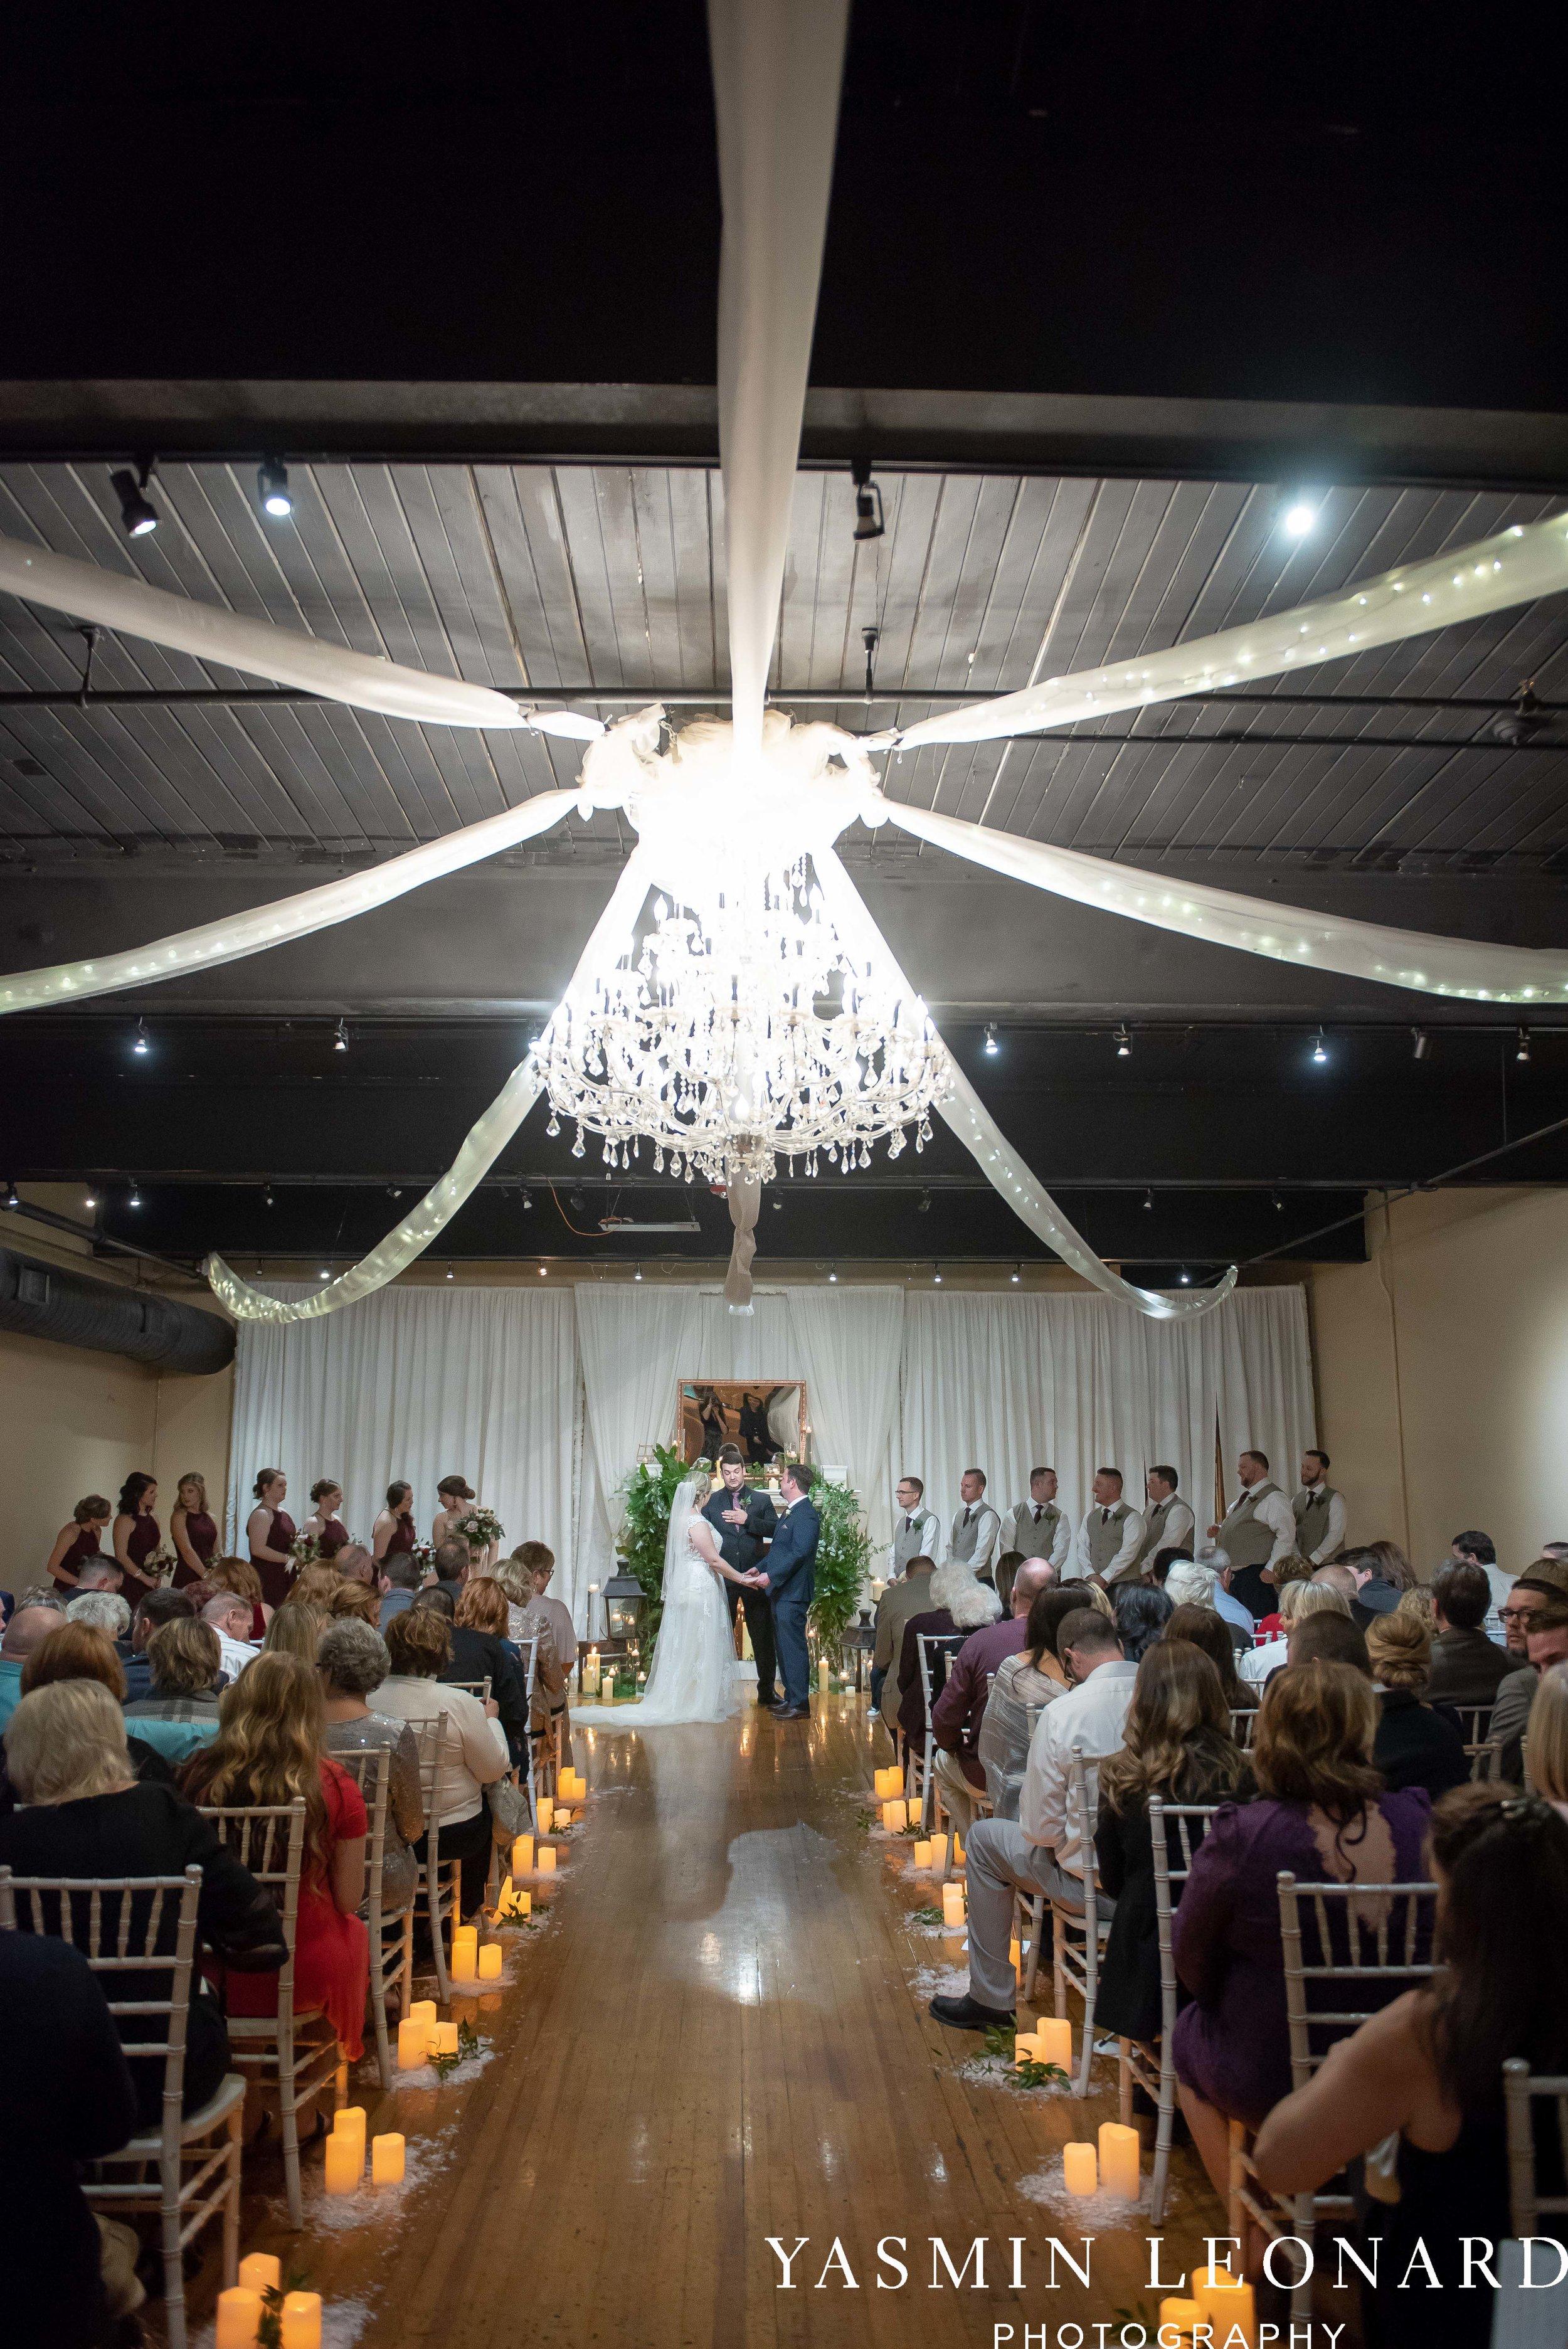 Rebekah and Matt - 105 Worth Event Centre - Yasmin Leonard Photography - Asheboro Wedding - NC Wedding - High Point Weddings - Triad Weddings - Winter Wedding-27.jpg